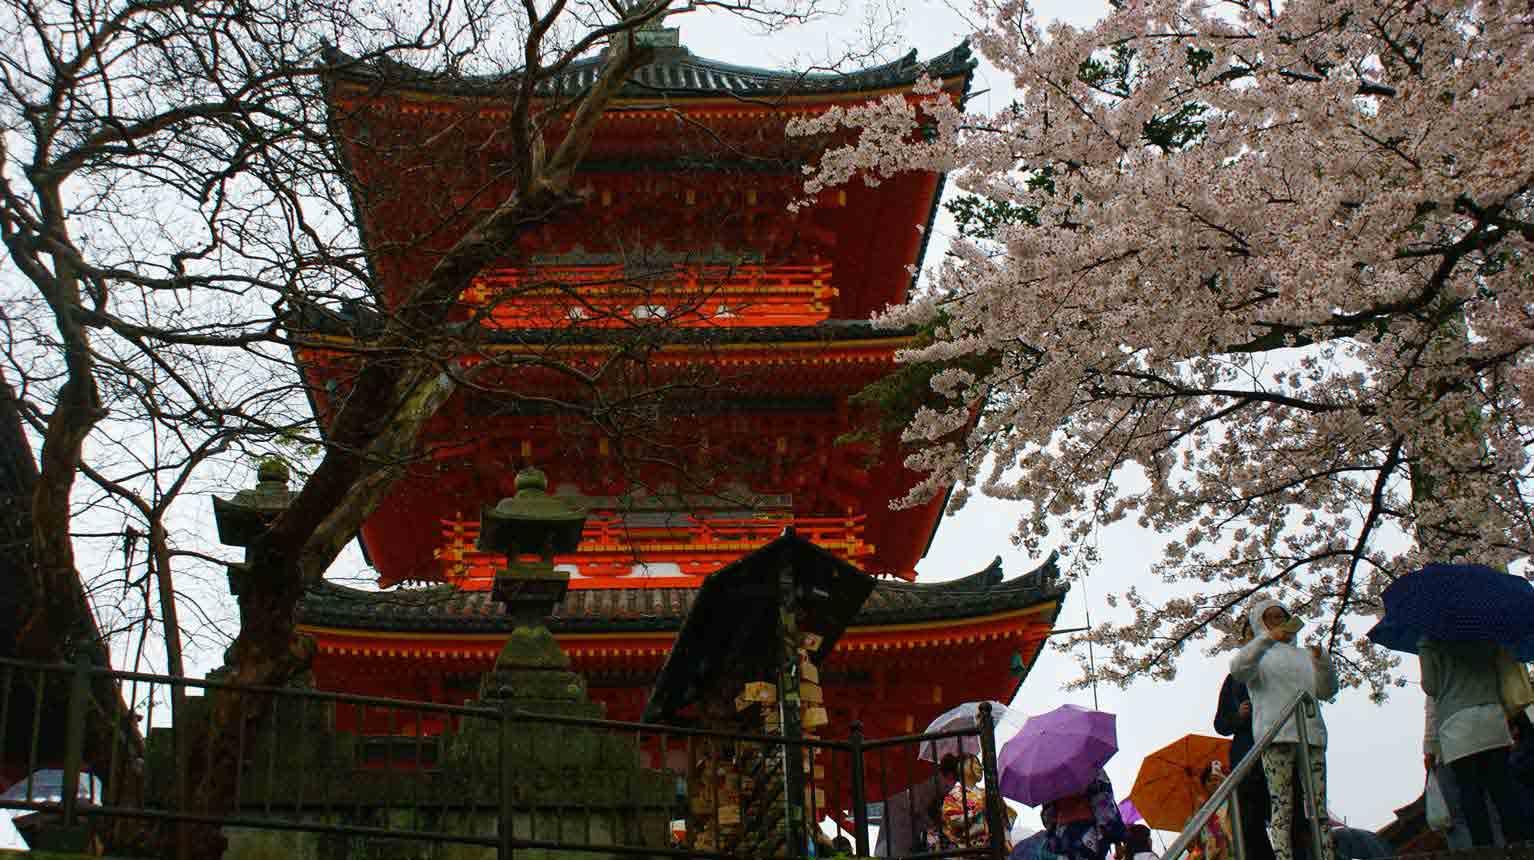 curly nomad asia japan temple pagoda hanami image